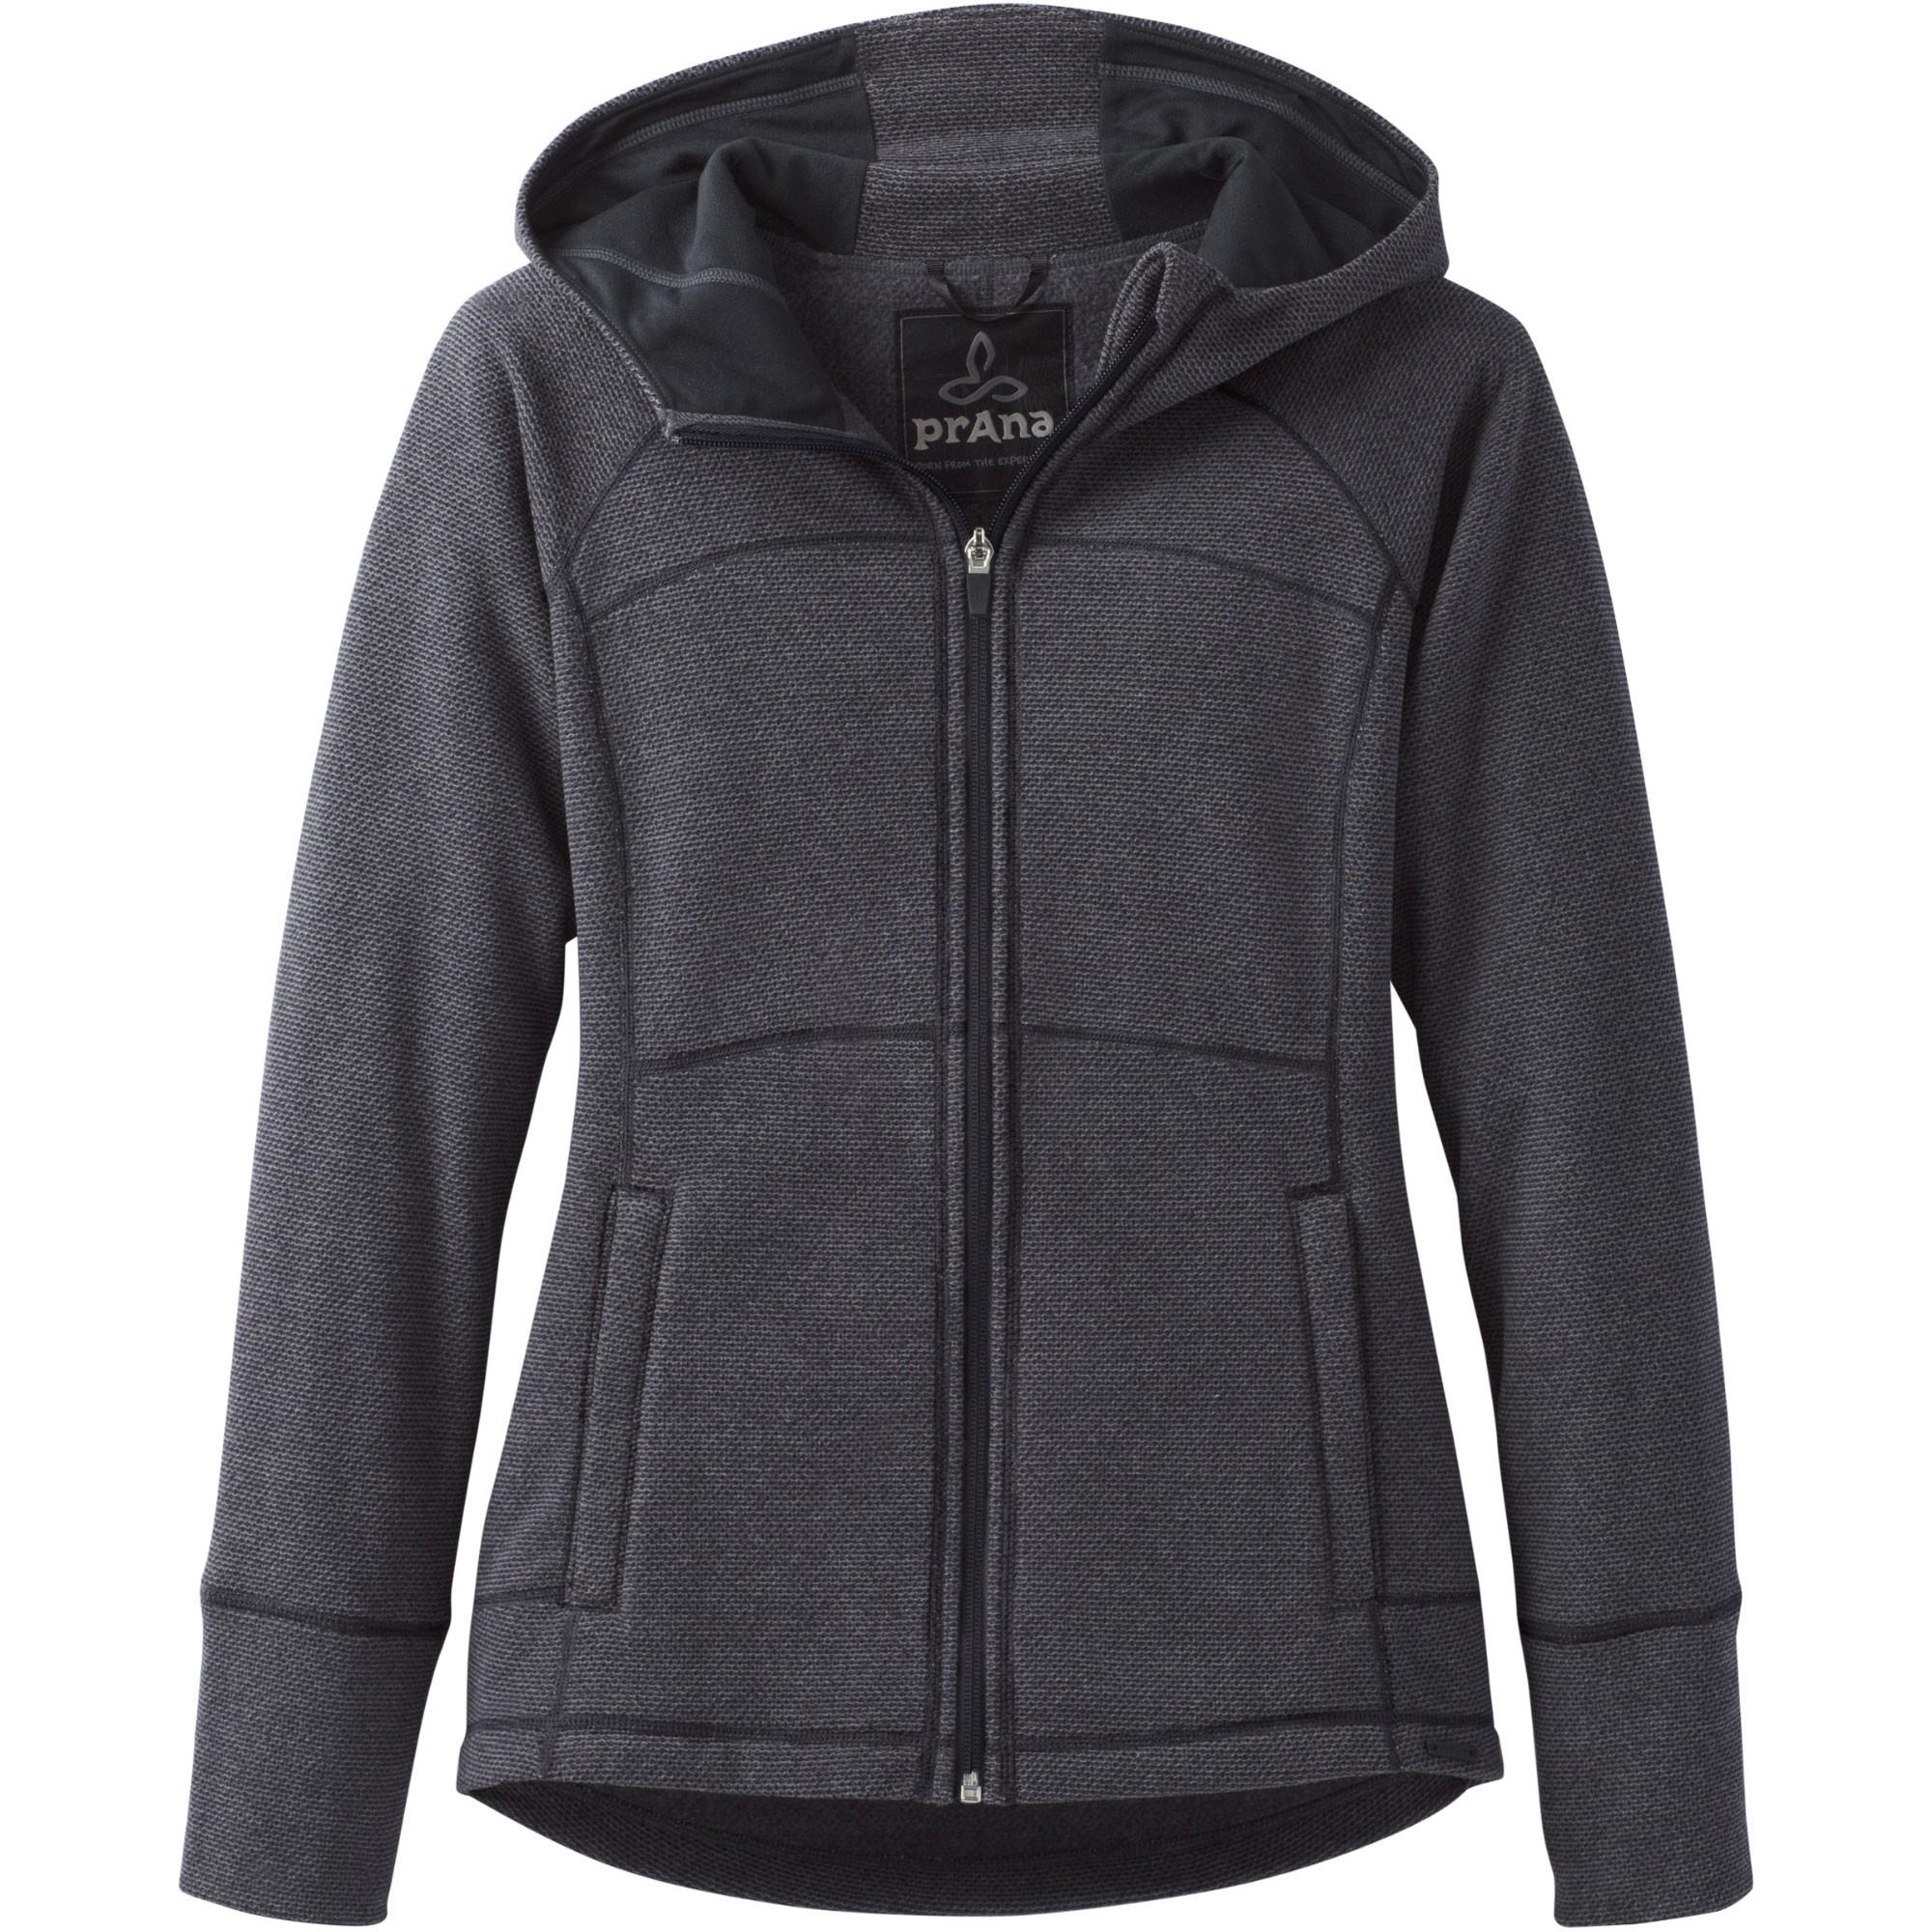 Prana-Rockaway-Jacket-Black